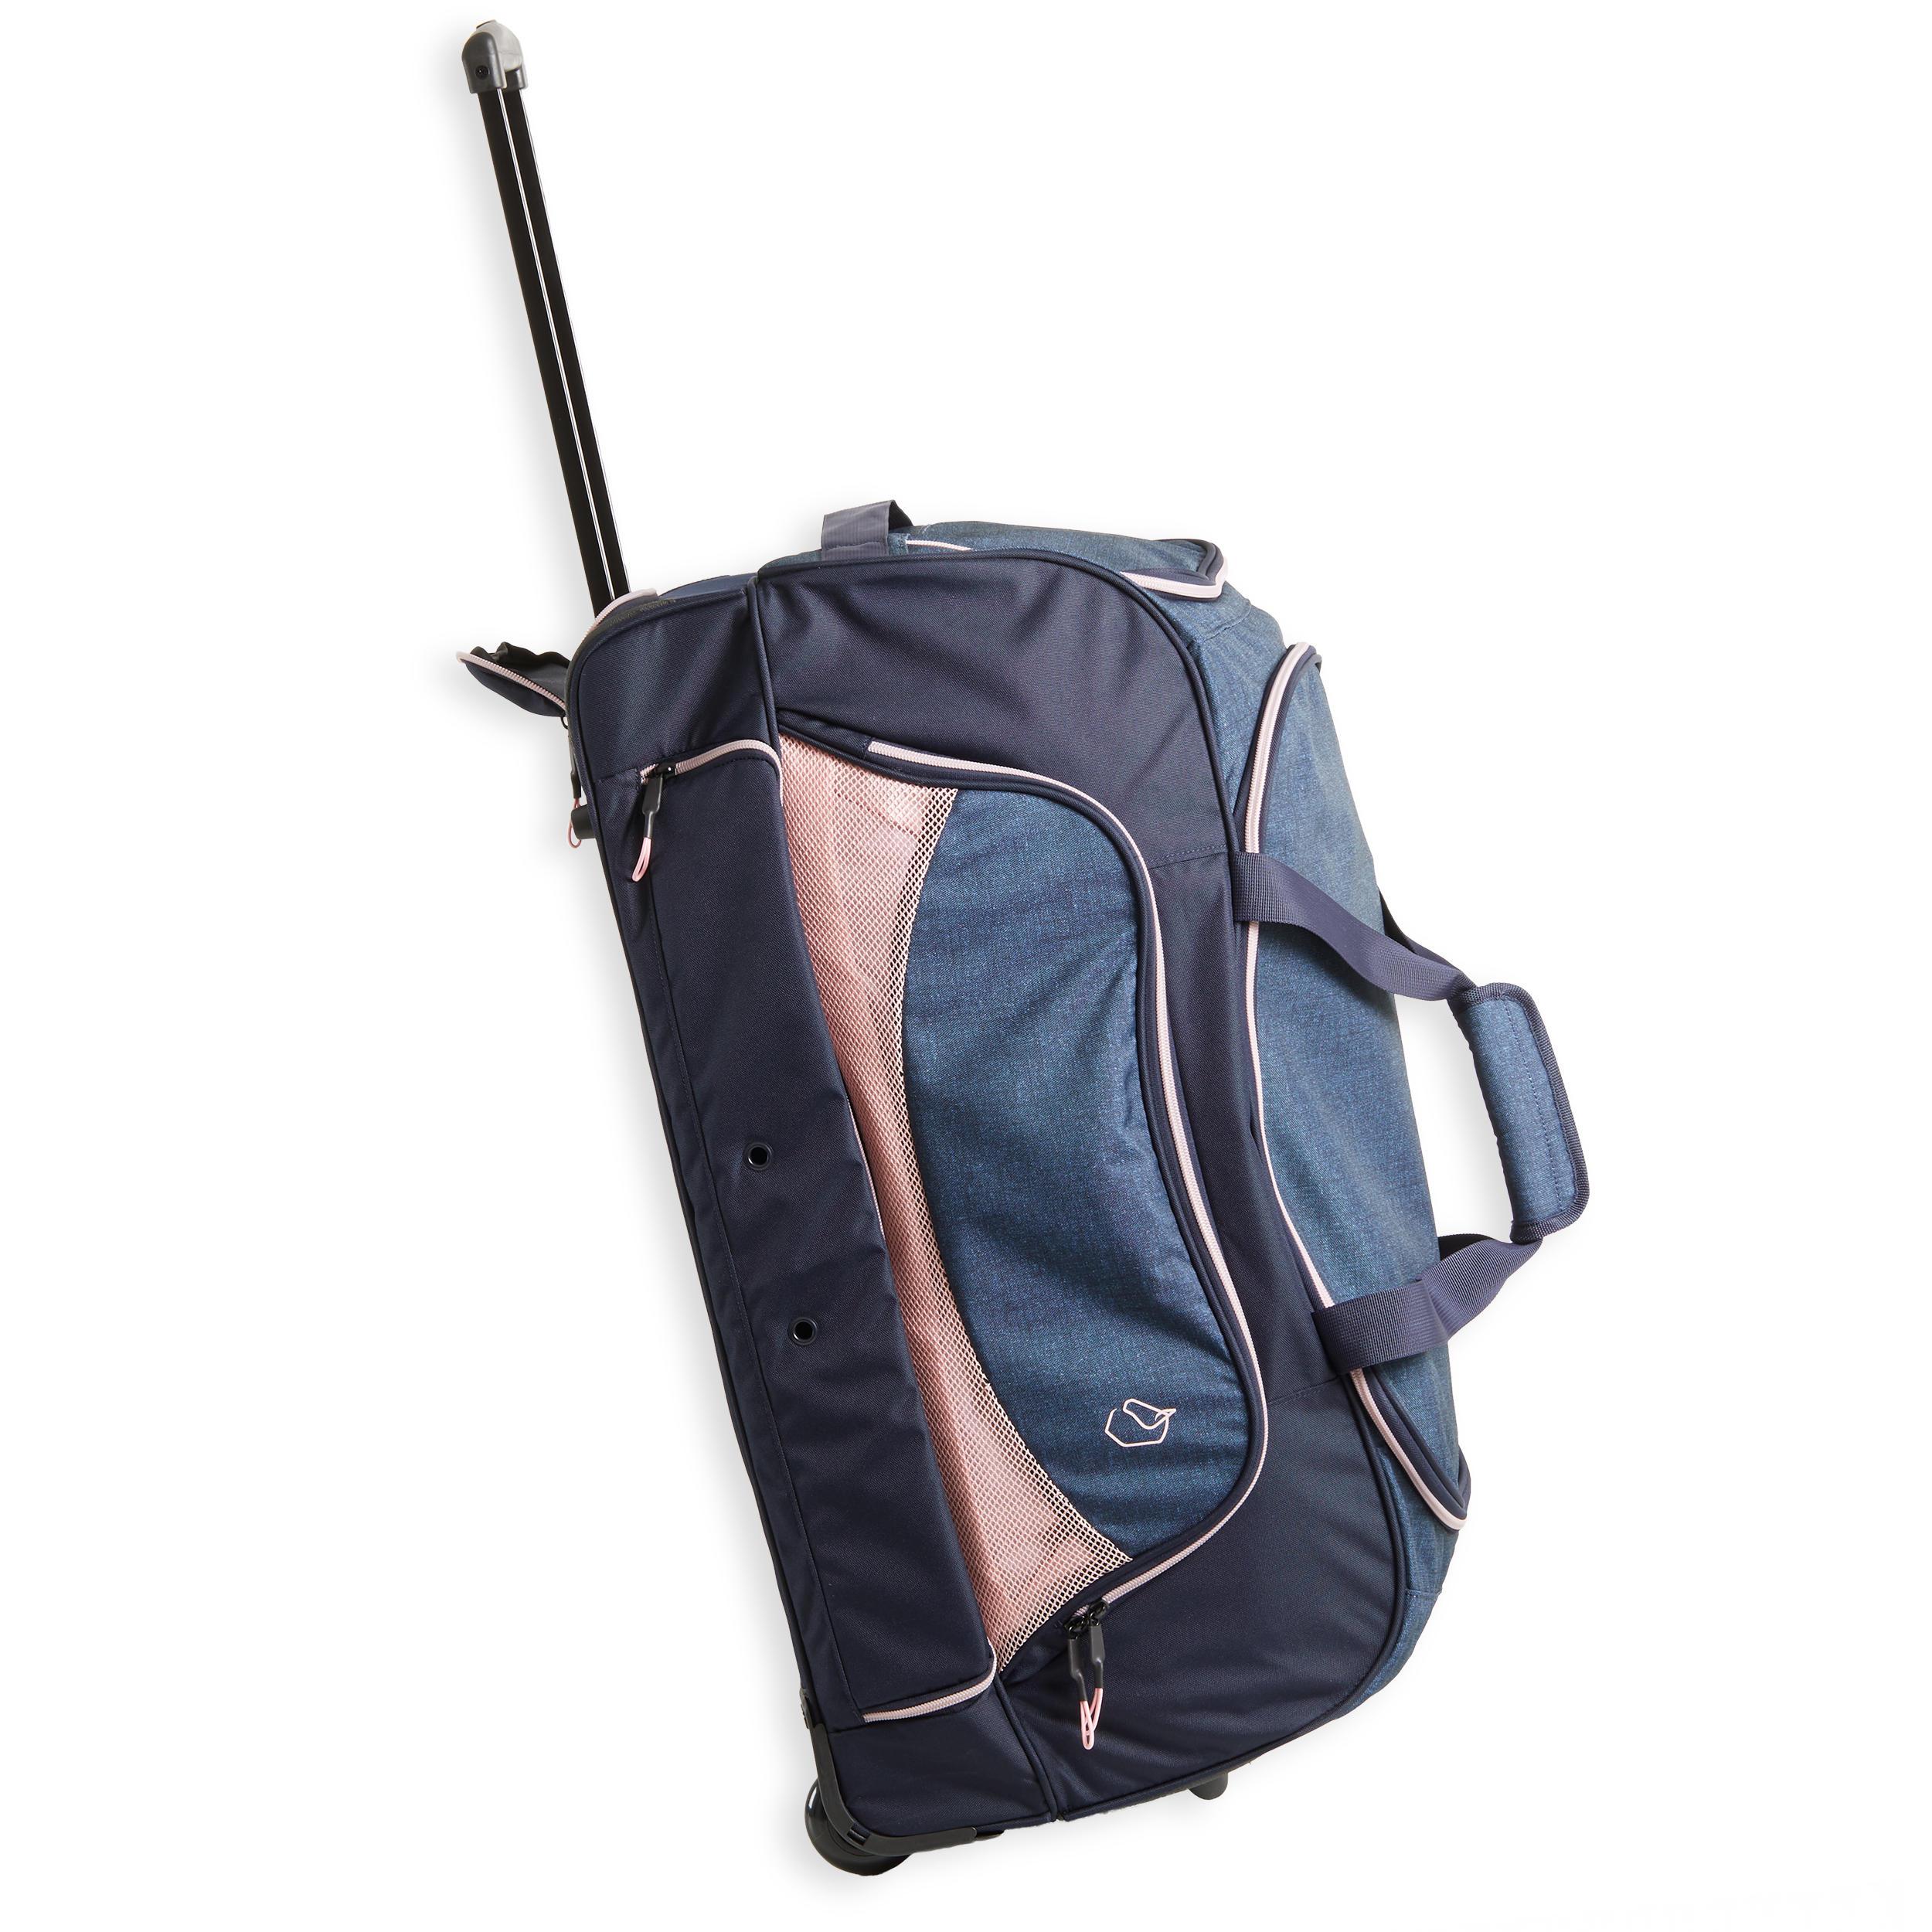 TROLER 80L albastru/roz